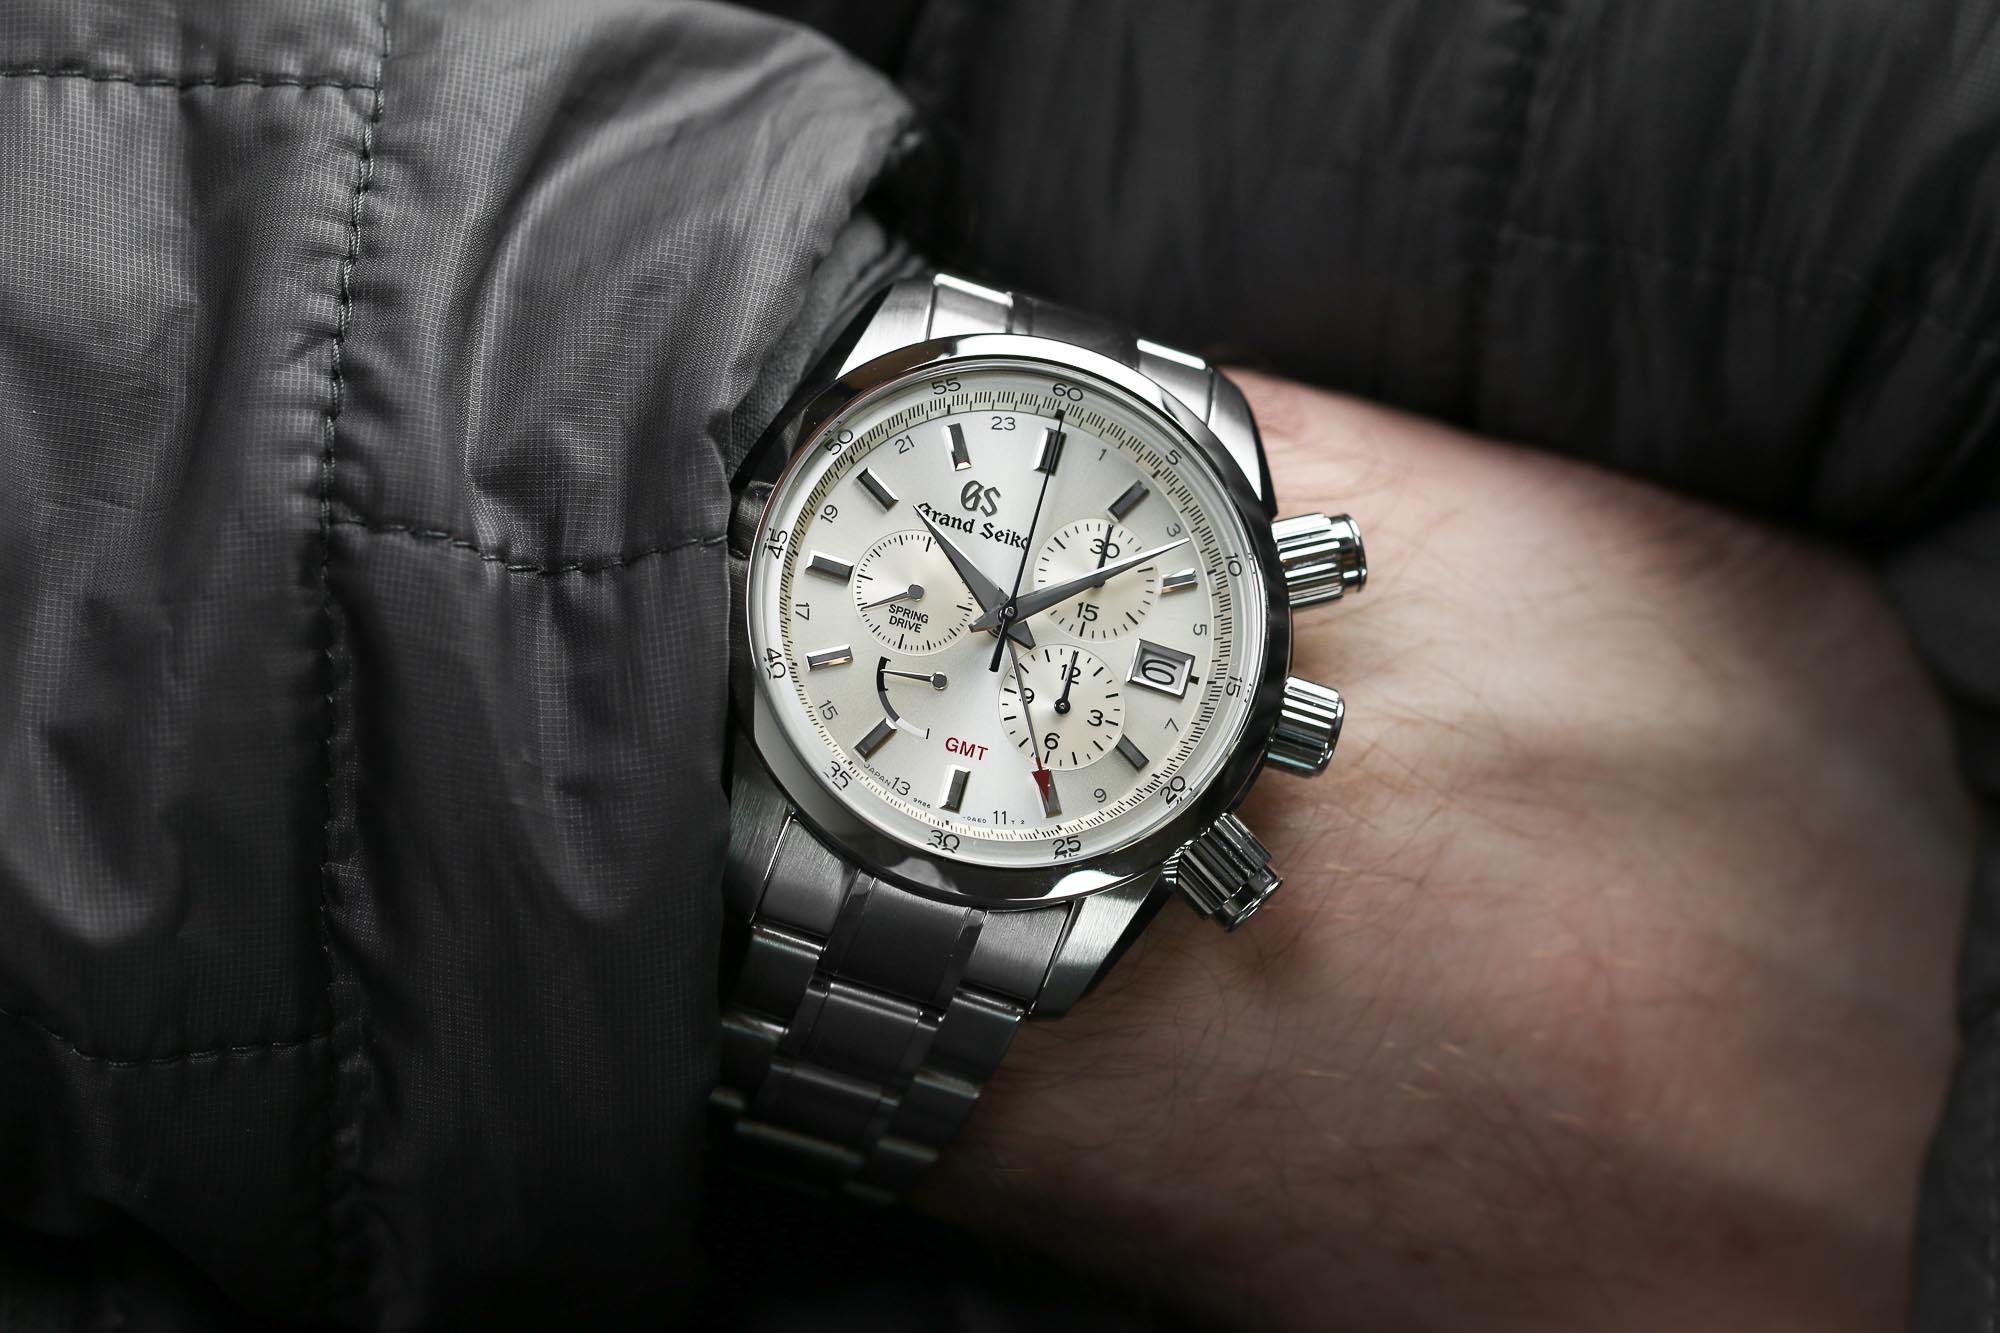 Grand Seiko SBGC201 on the wrist.